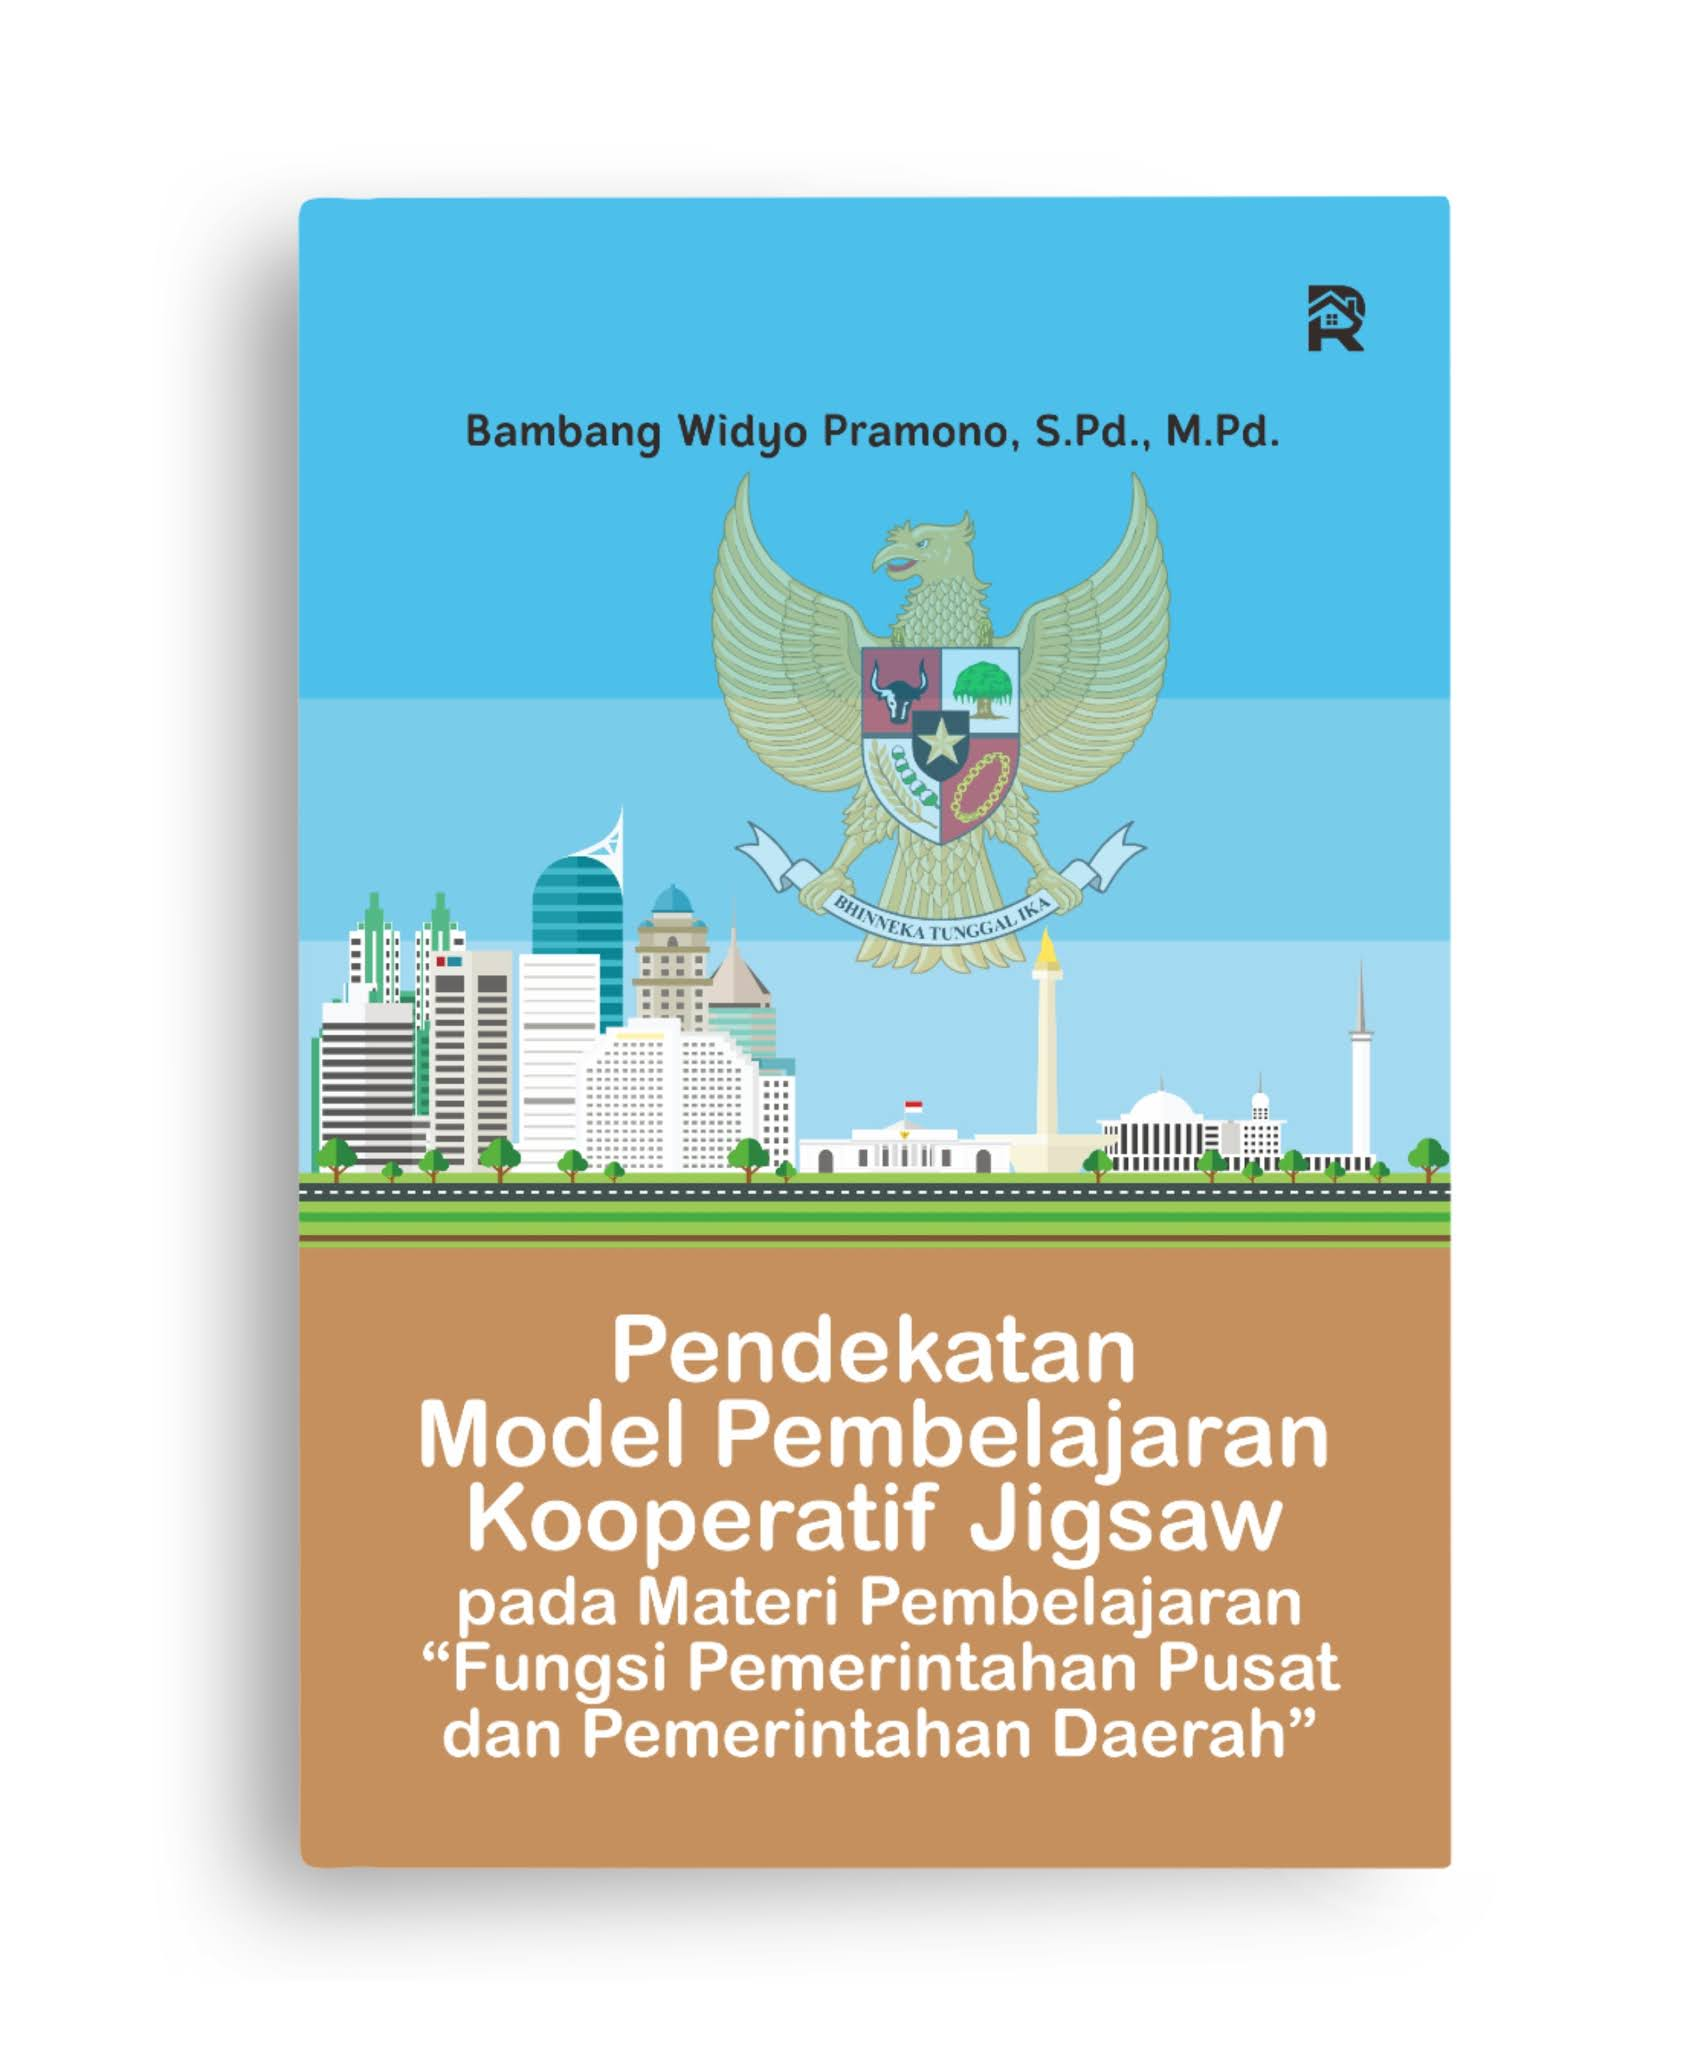 "Pendekatan Model Pembelajaran Kooperatif Jigsaw pada Materi Pembelajaran ""Fungsi Pemerintahan Pusat dan Pemerintahan Daerah"""